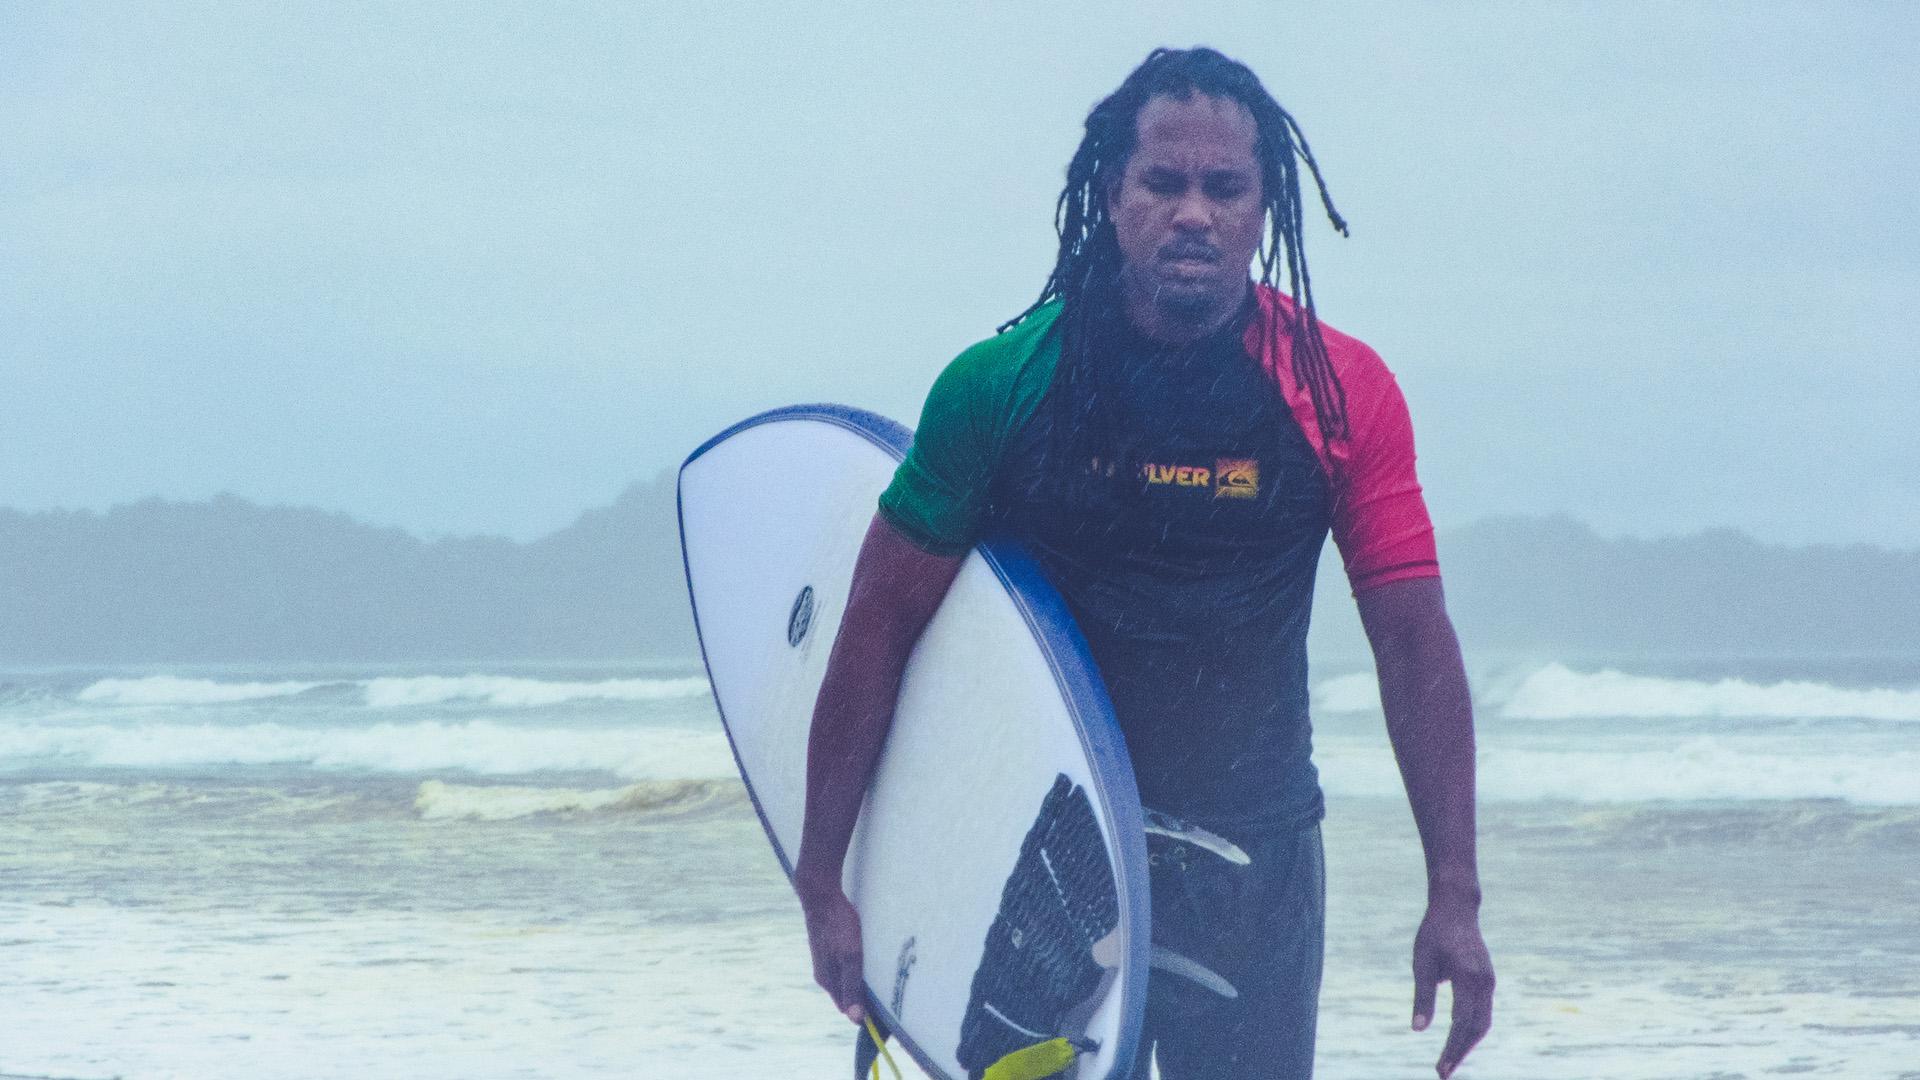 Playa Guiones Choppy Surf Overcast Rainy Season